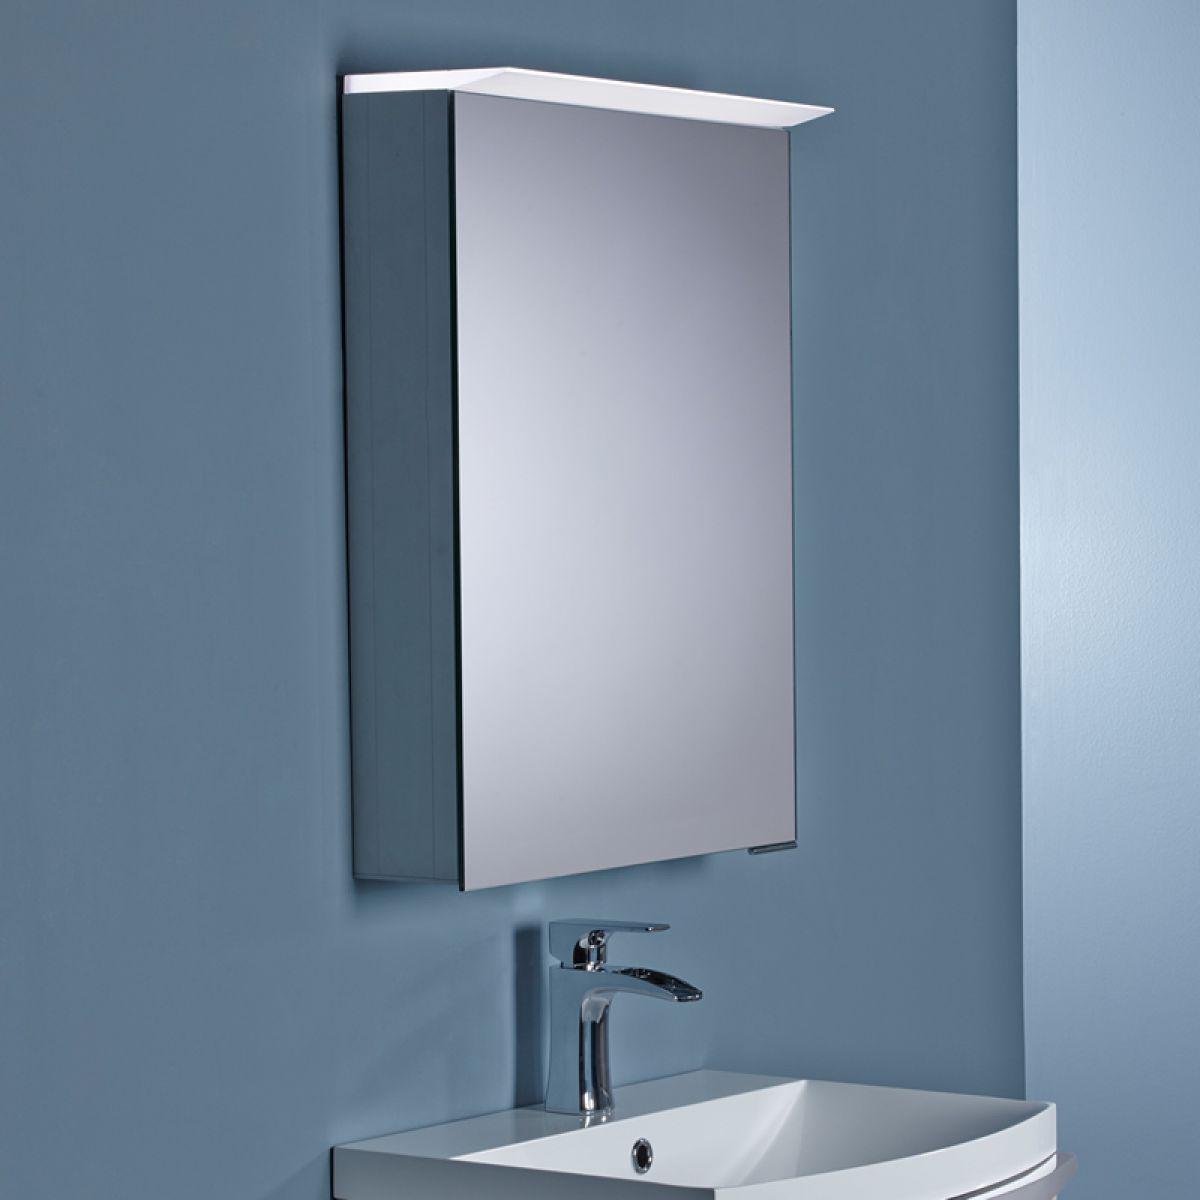 Awe Inspiring Roper Rhodes Vantage Illuminated Bathroom Cabinet Home Interior And Landscaping Oversignezvosmurscom